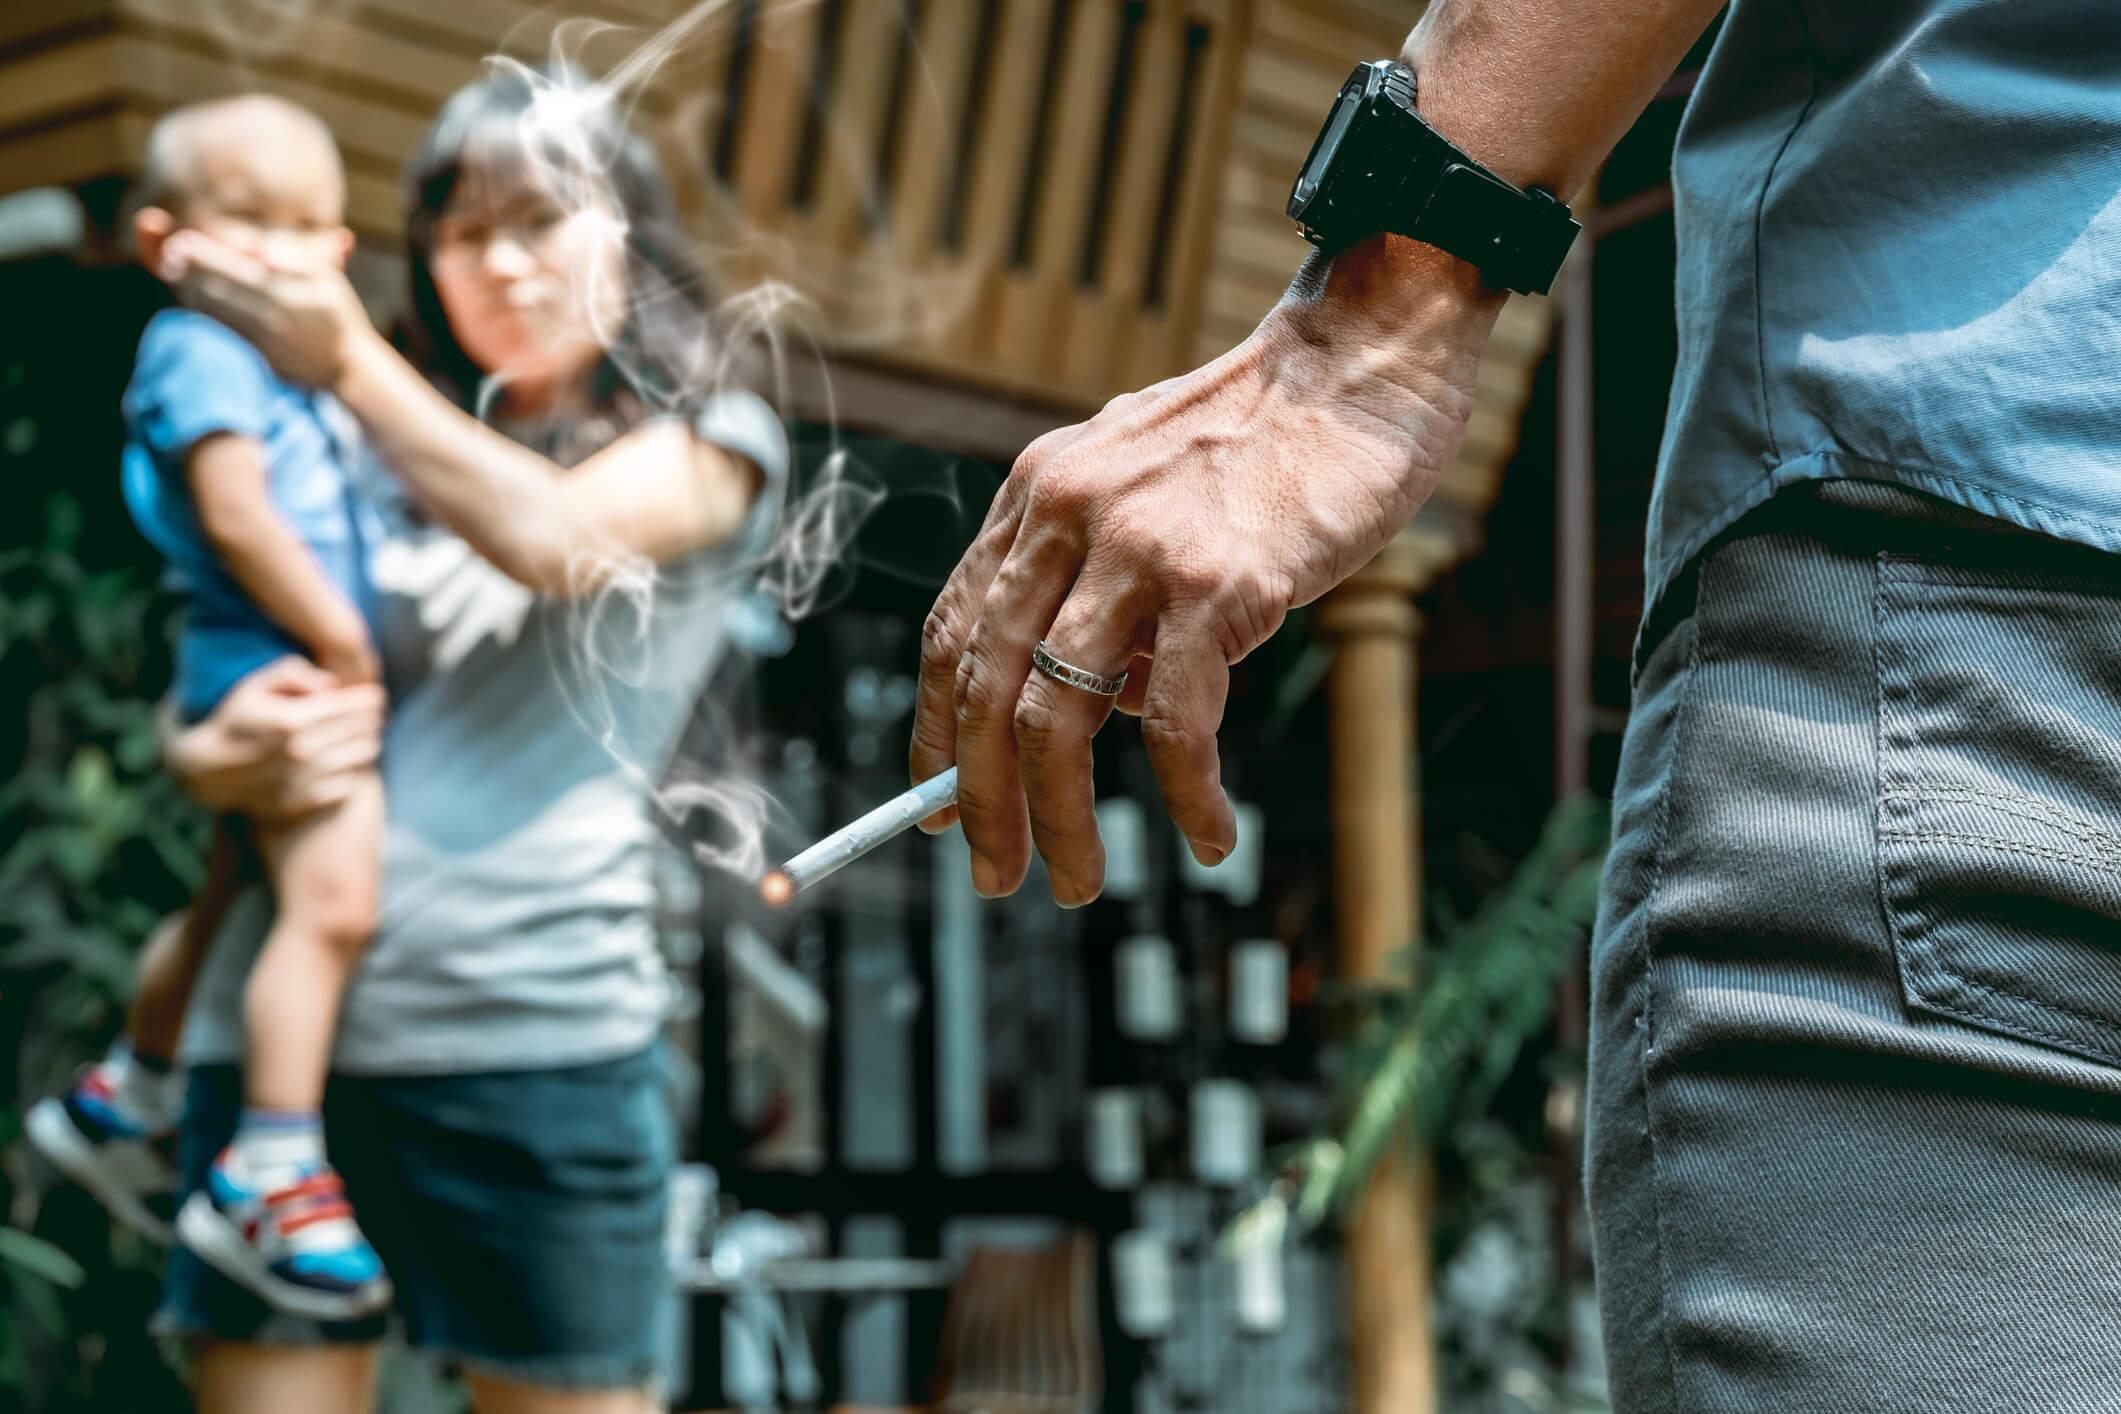 bronchite chronique tabac